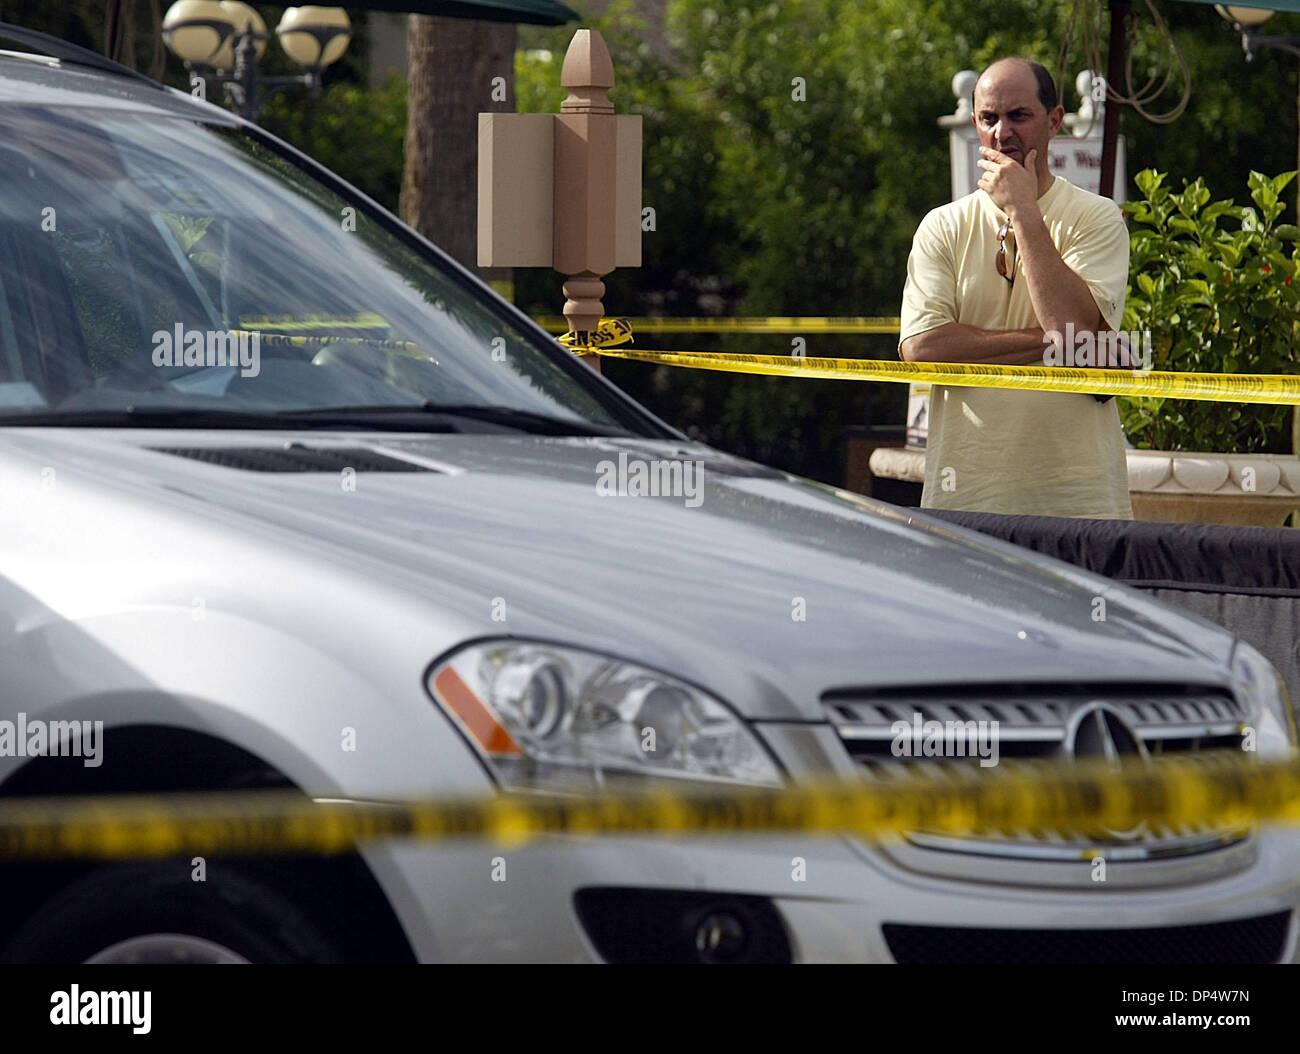 Car Wash Boca Raton >> Aug 25 2006 Boca Raton Fl Usa The Owner Of A Mercedes